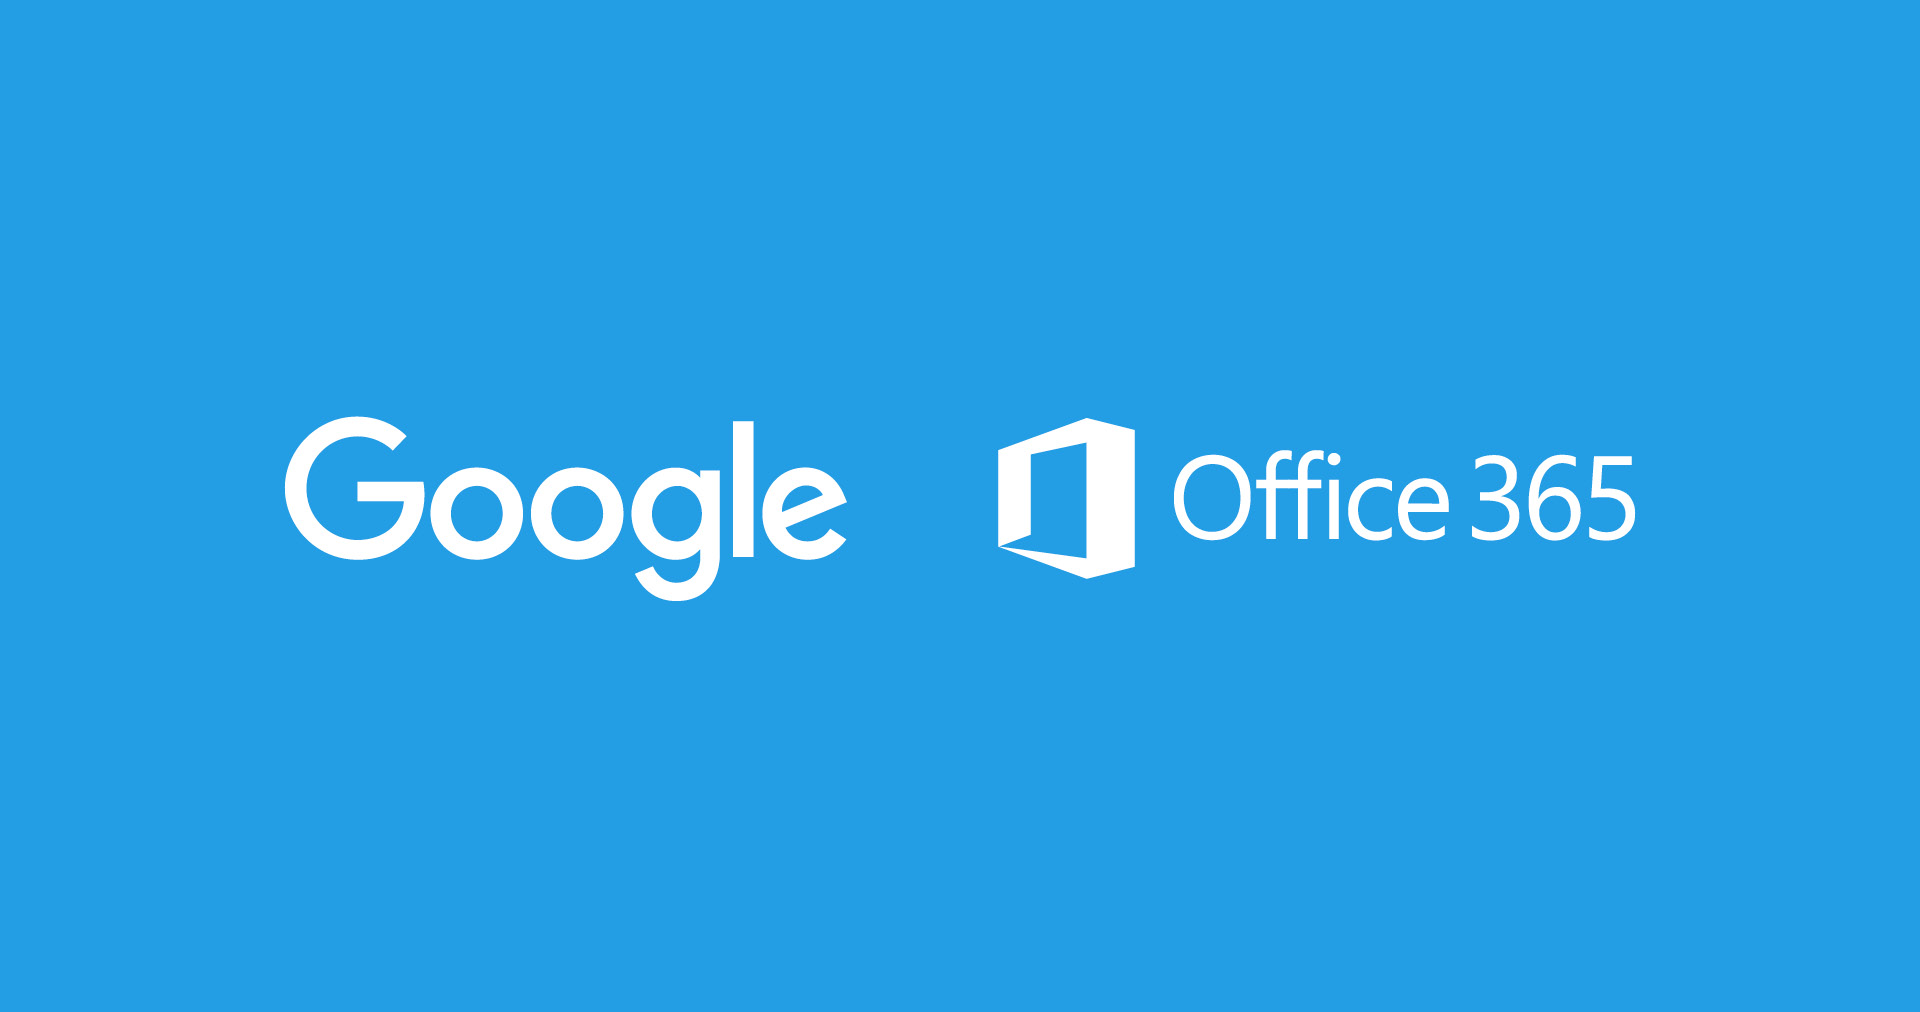 Google Office 365